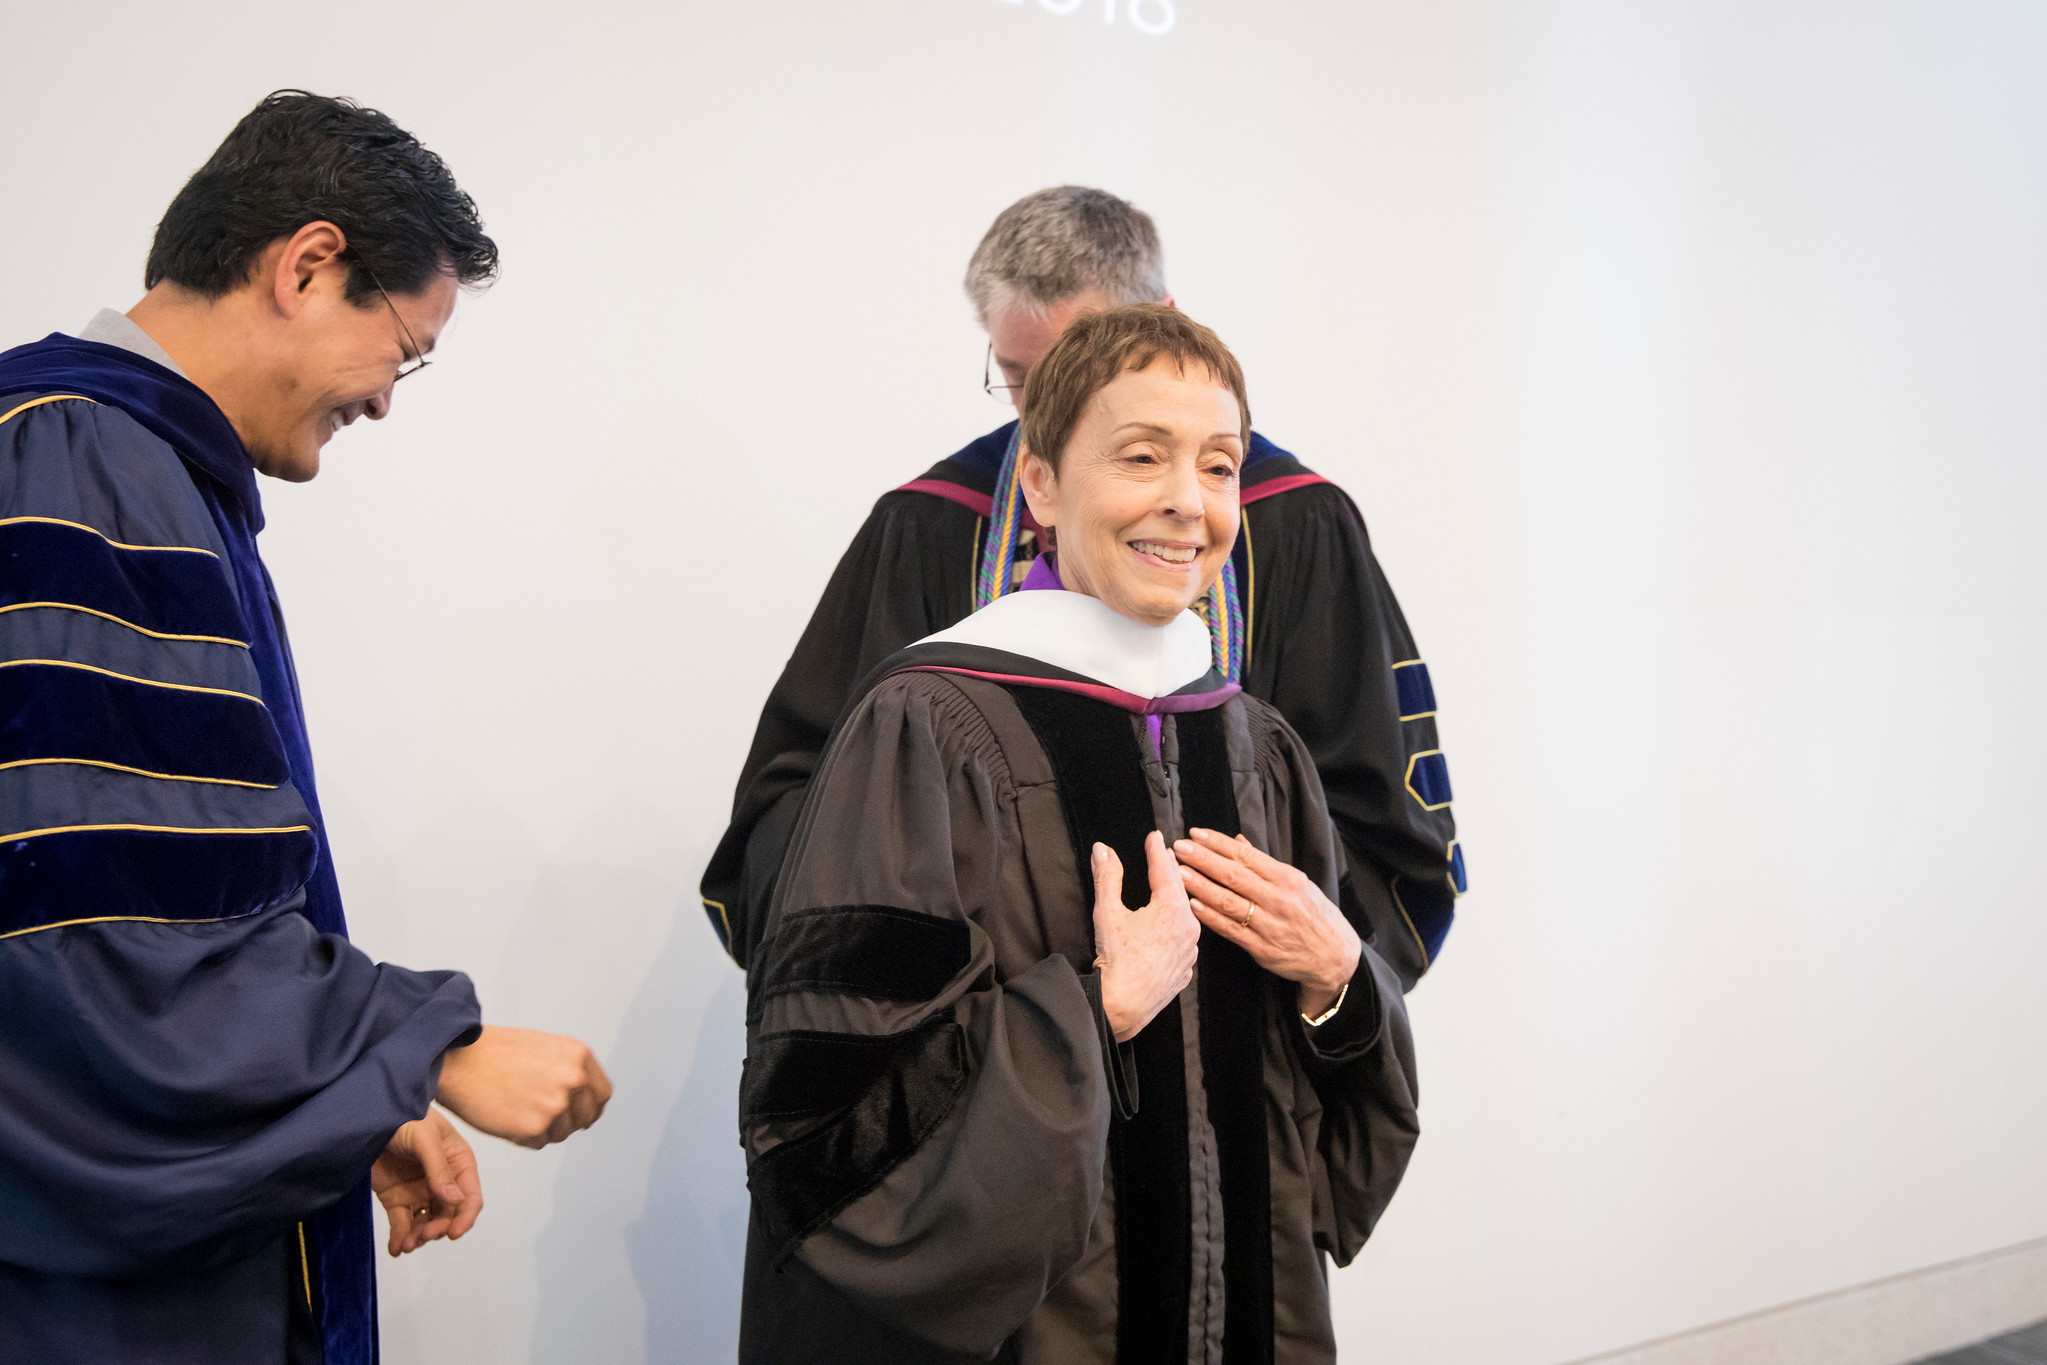 Gail YouTube - Gail Abarbanel Receives Honorary LMU Degree